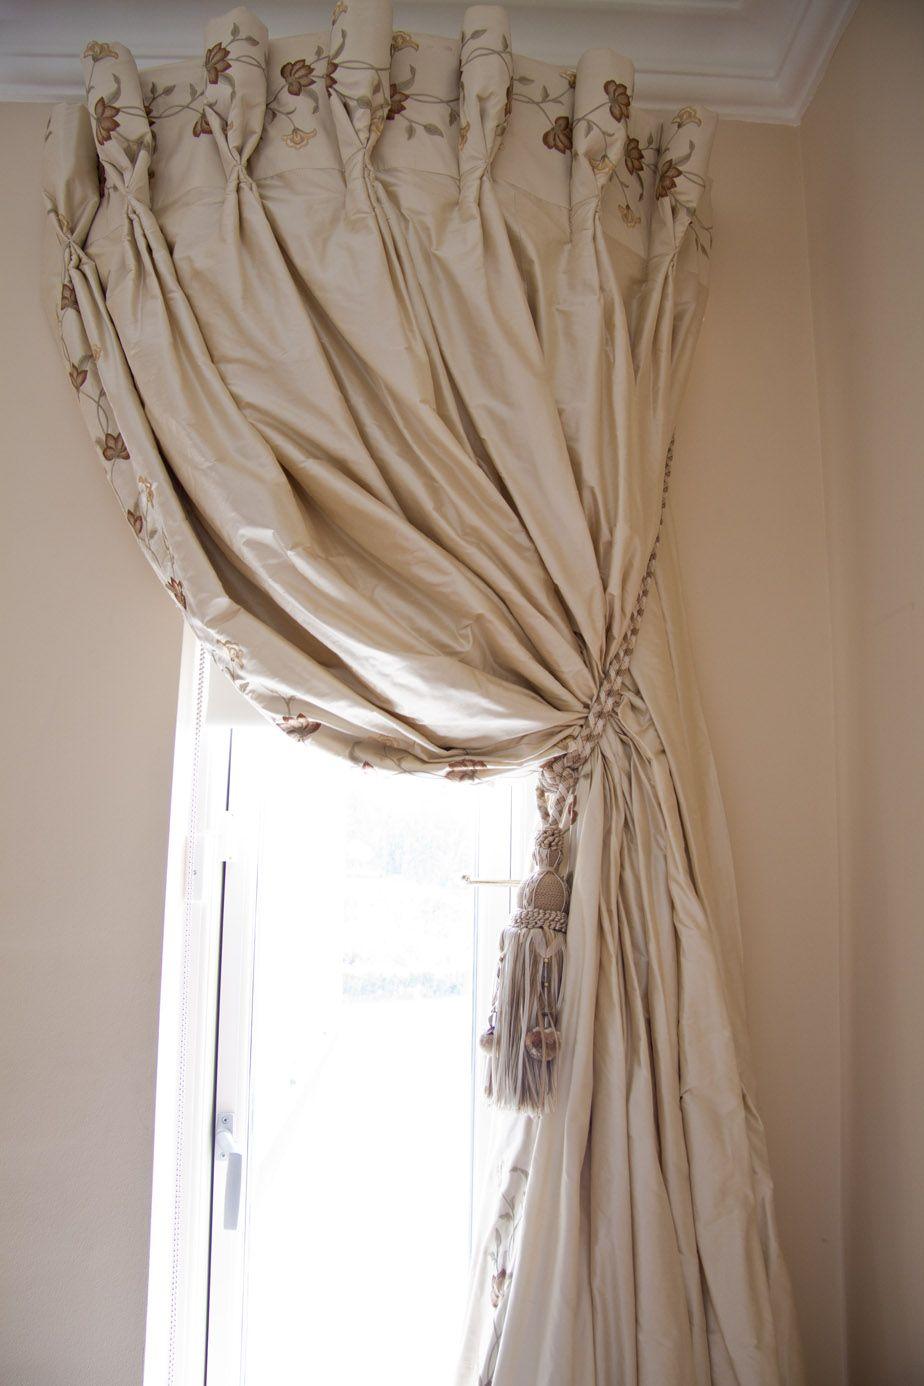 Curtains for half moon windows